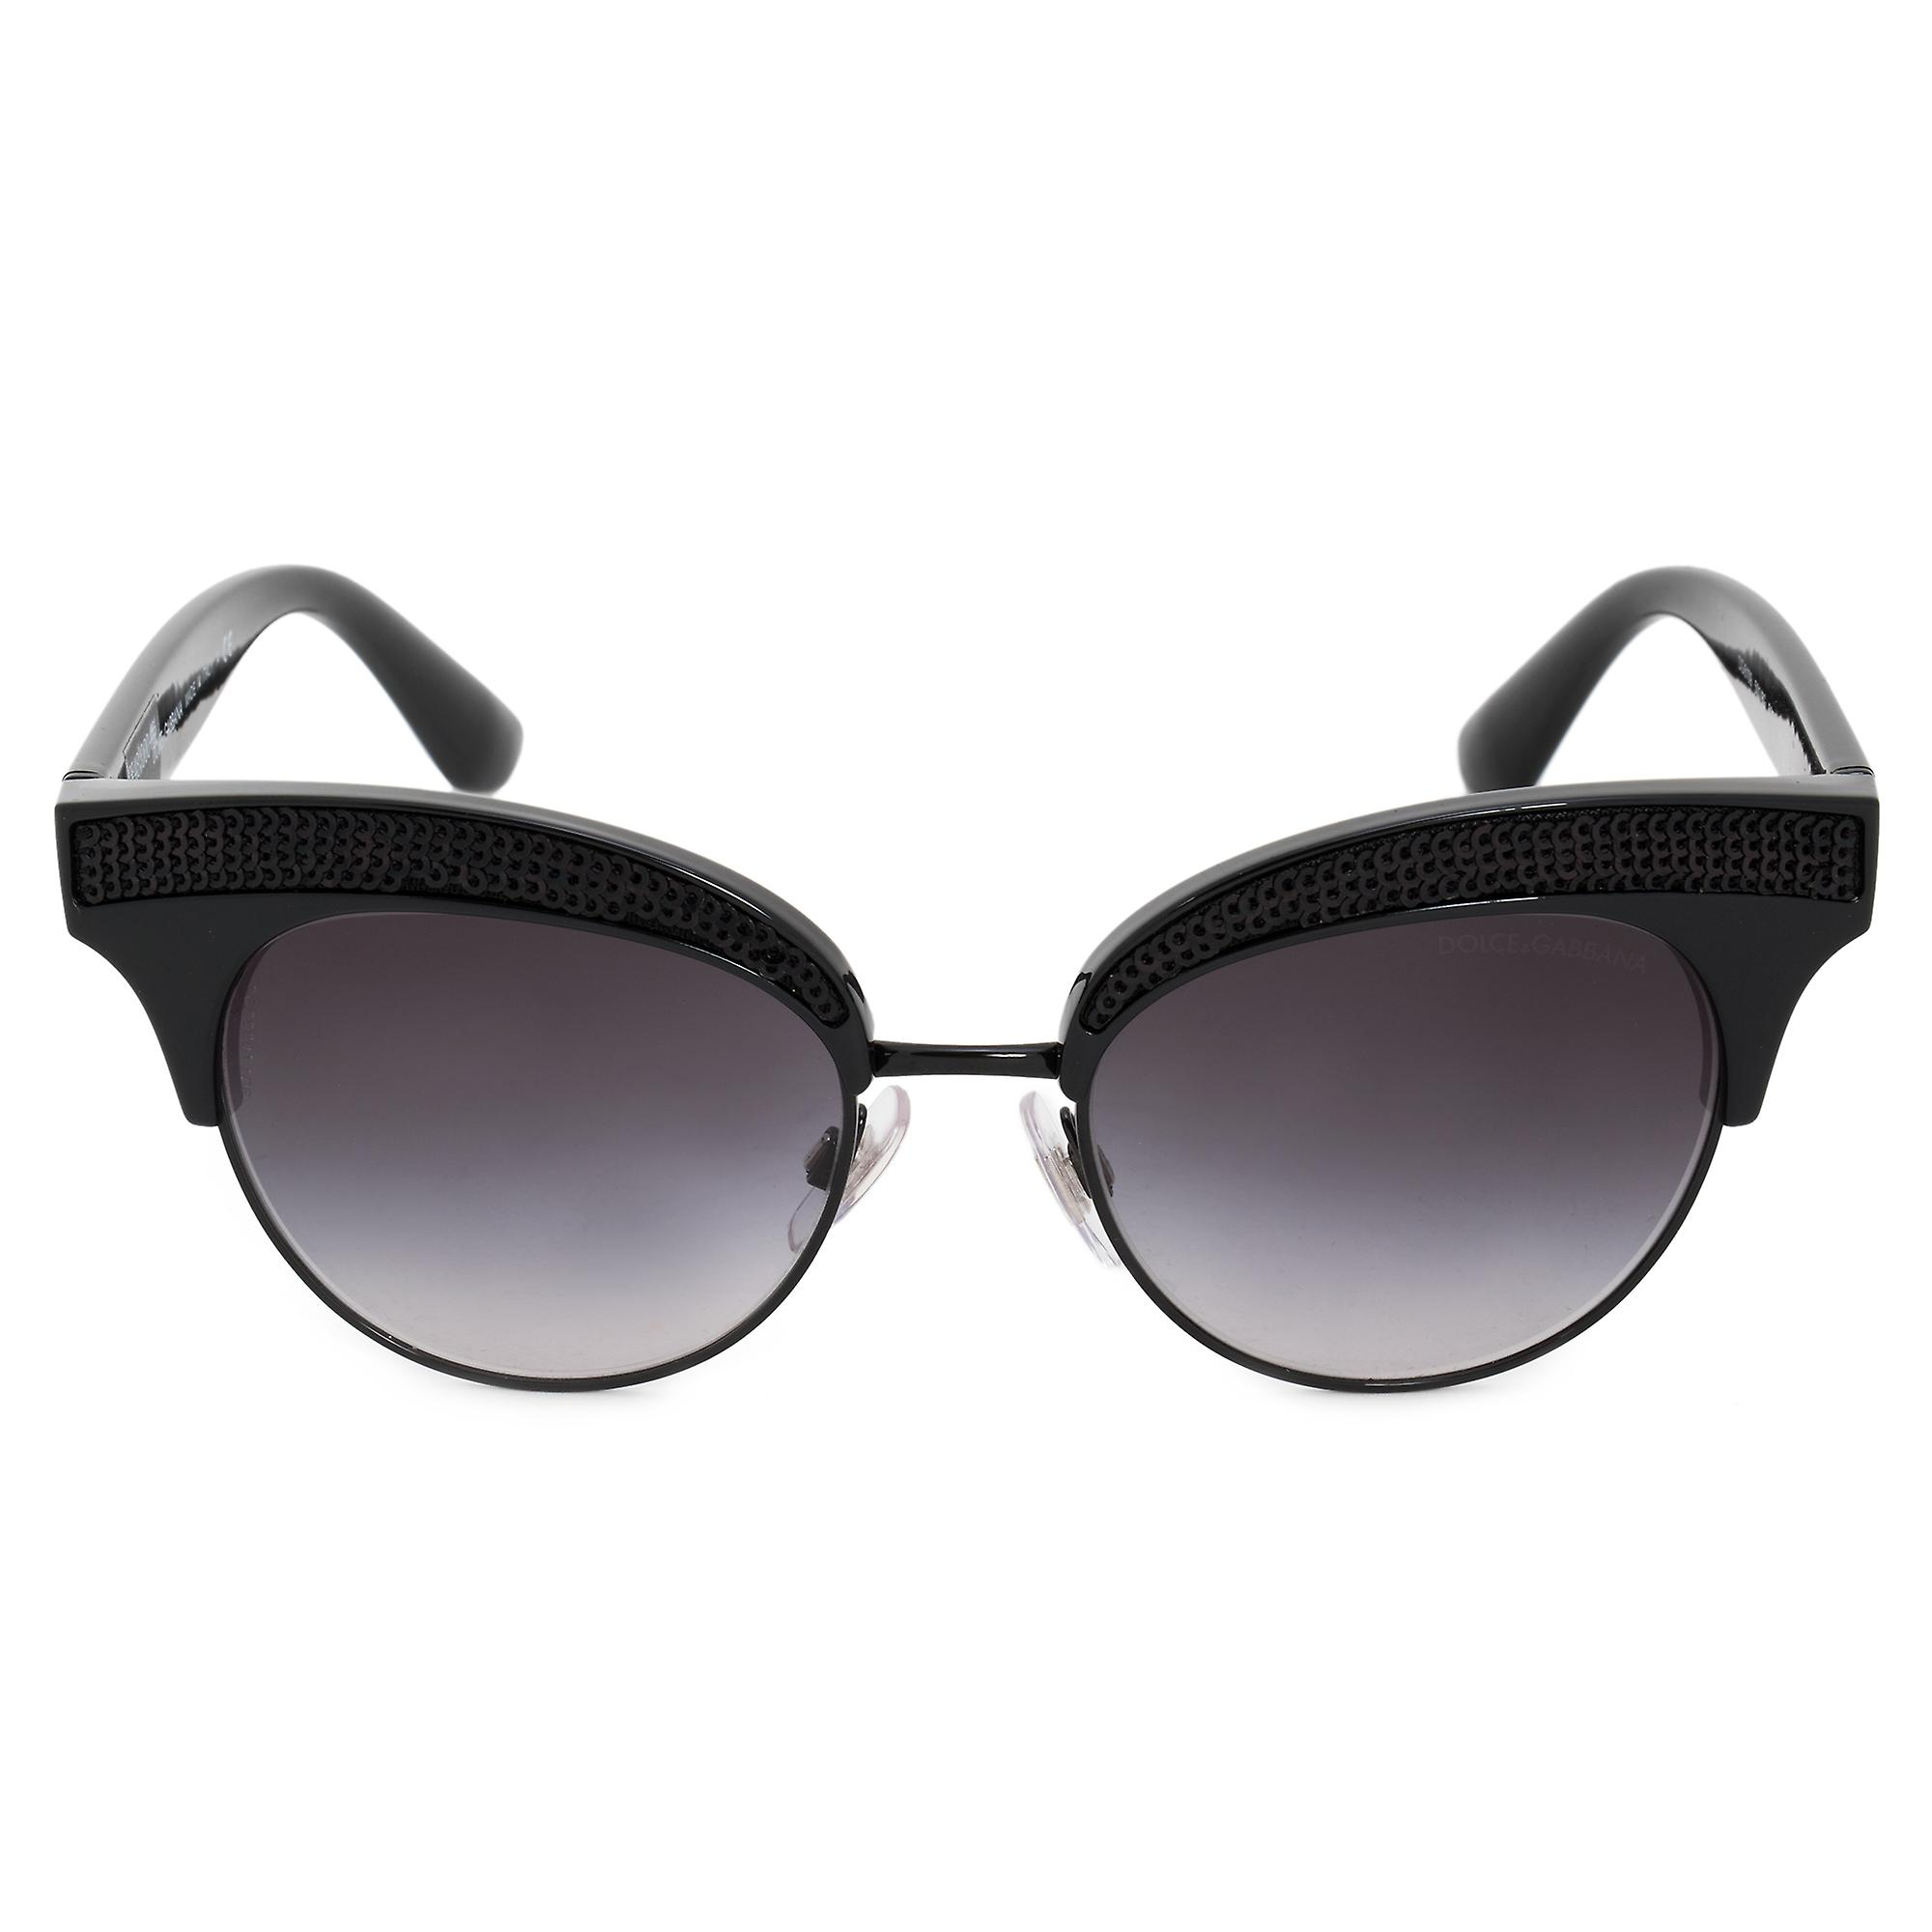 Dolce & Gabbana Cat Eye Sunglasses DG6109 501/8G 50